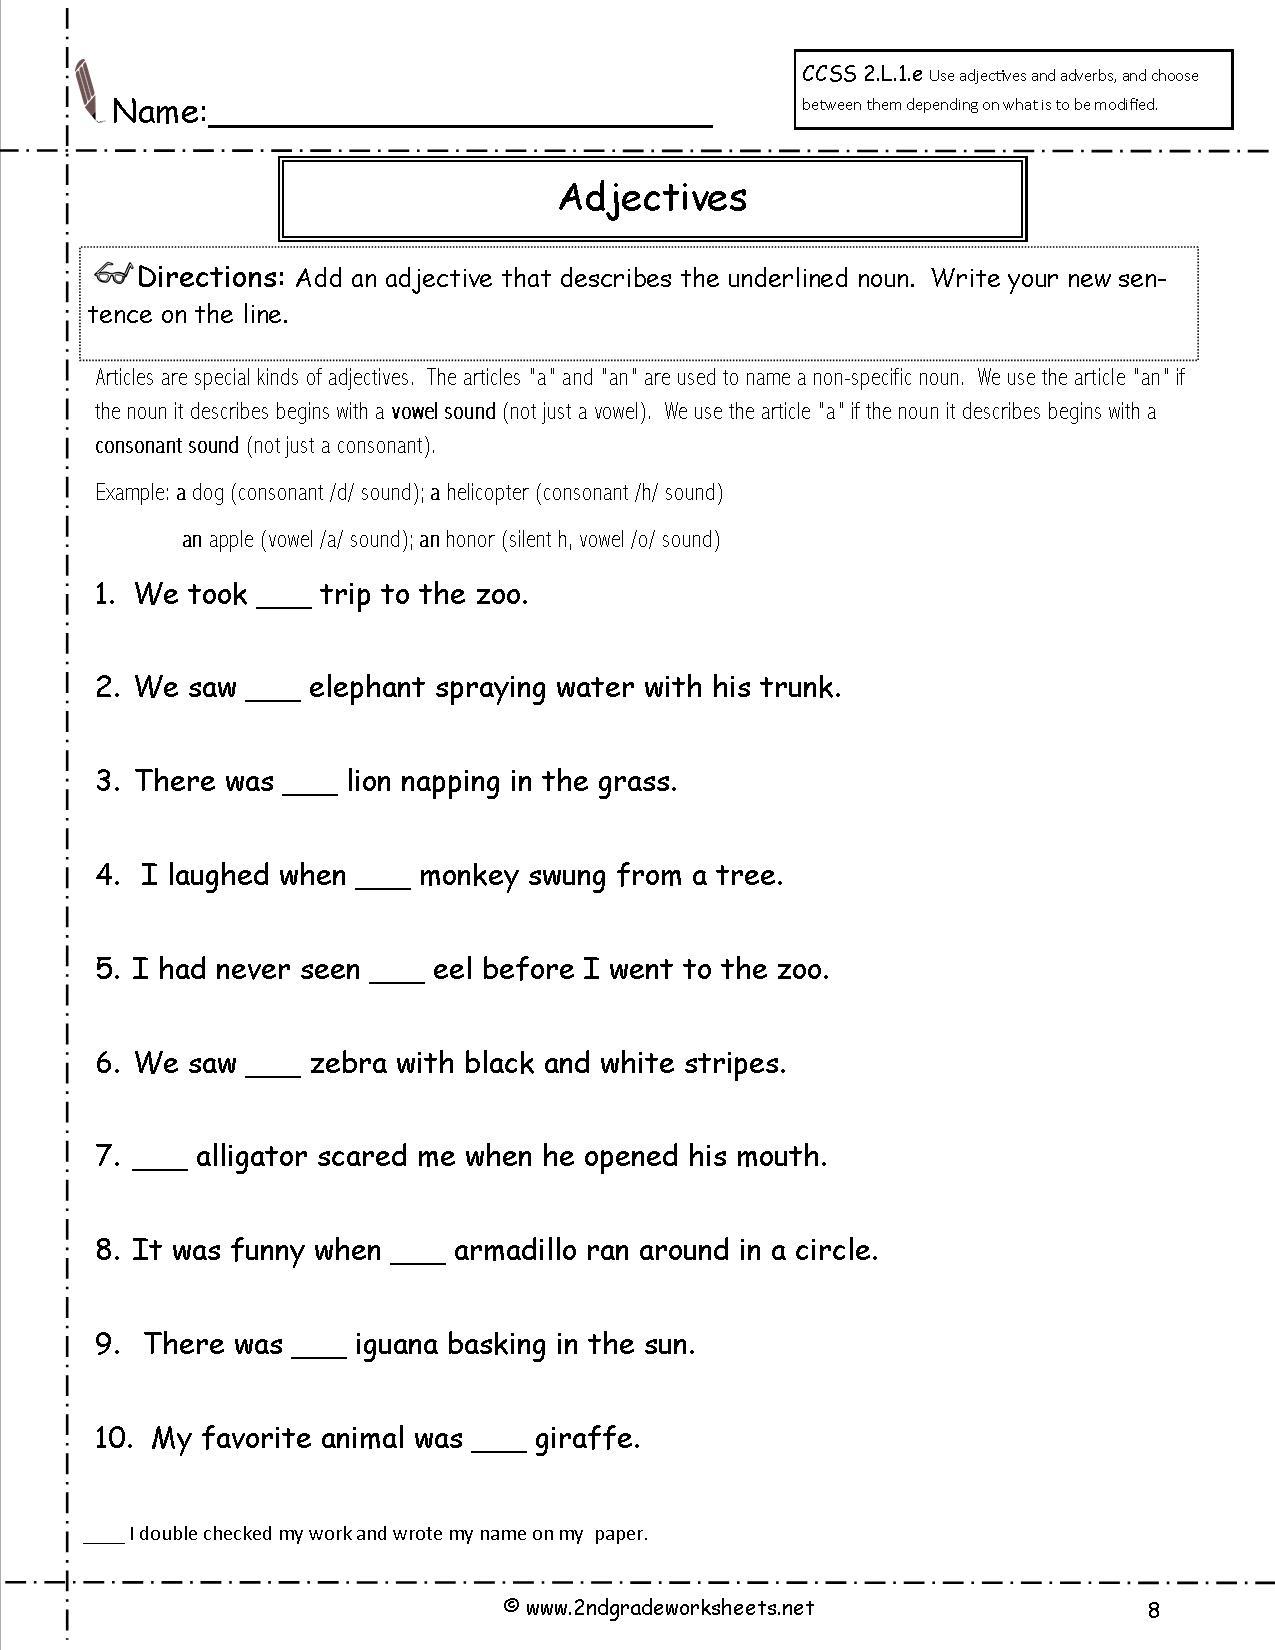 Free Language/grammar Worksheets And Printouts   Free Printable Grammar Worksheets